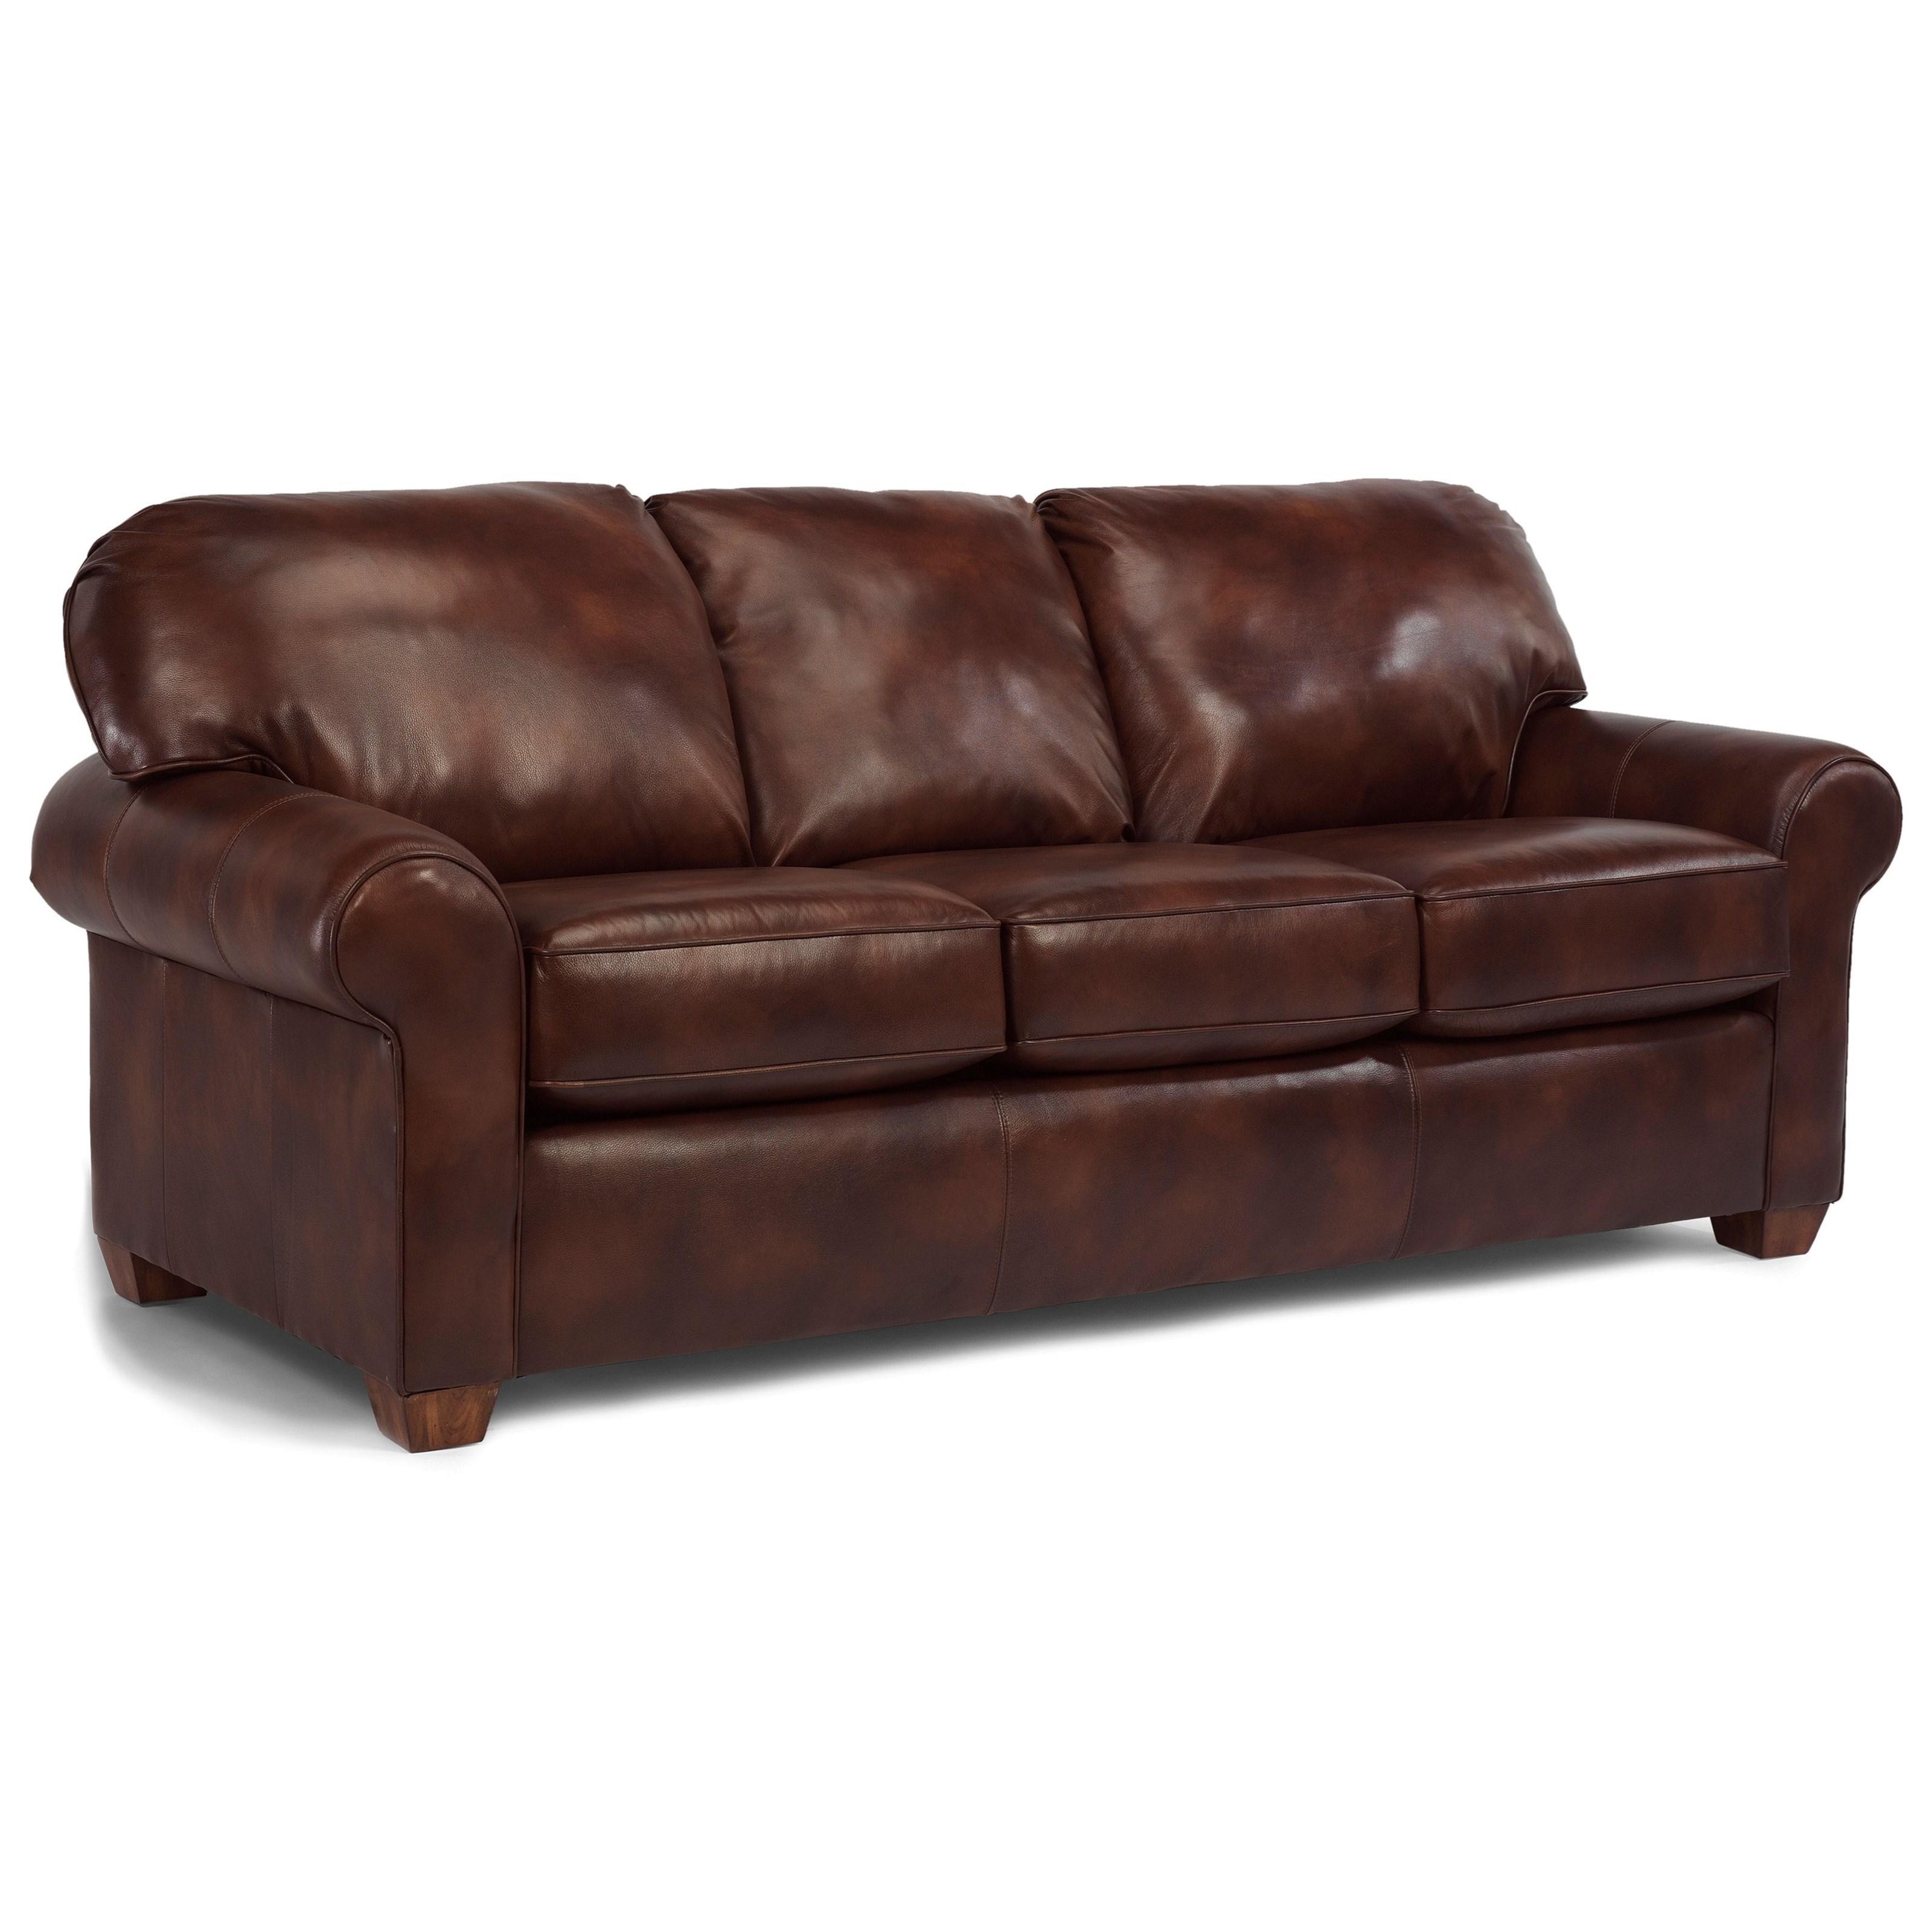 Flexsteel Thornton Stationary Upholstered Sofa Knight Furniture Mattress Sofas